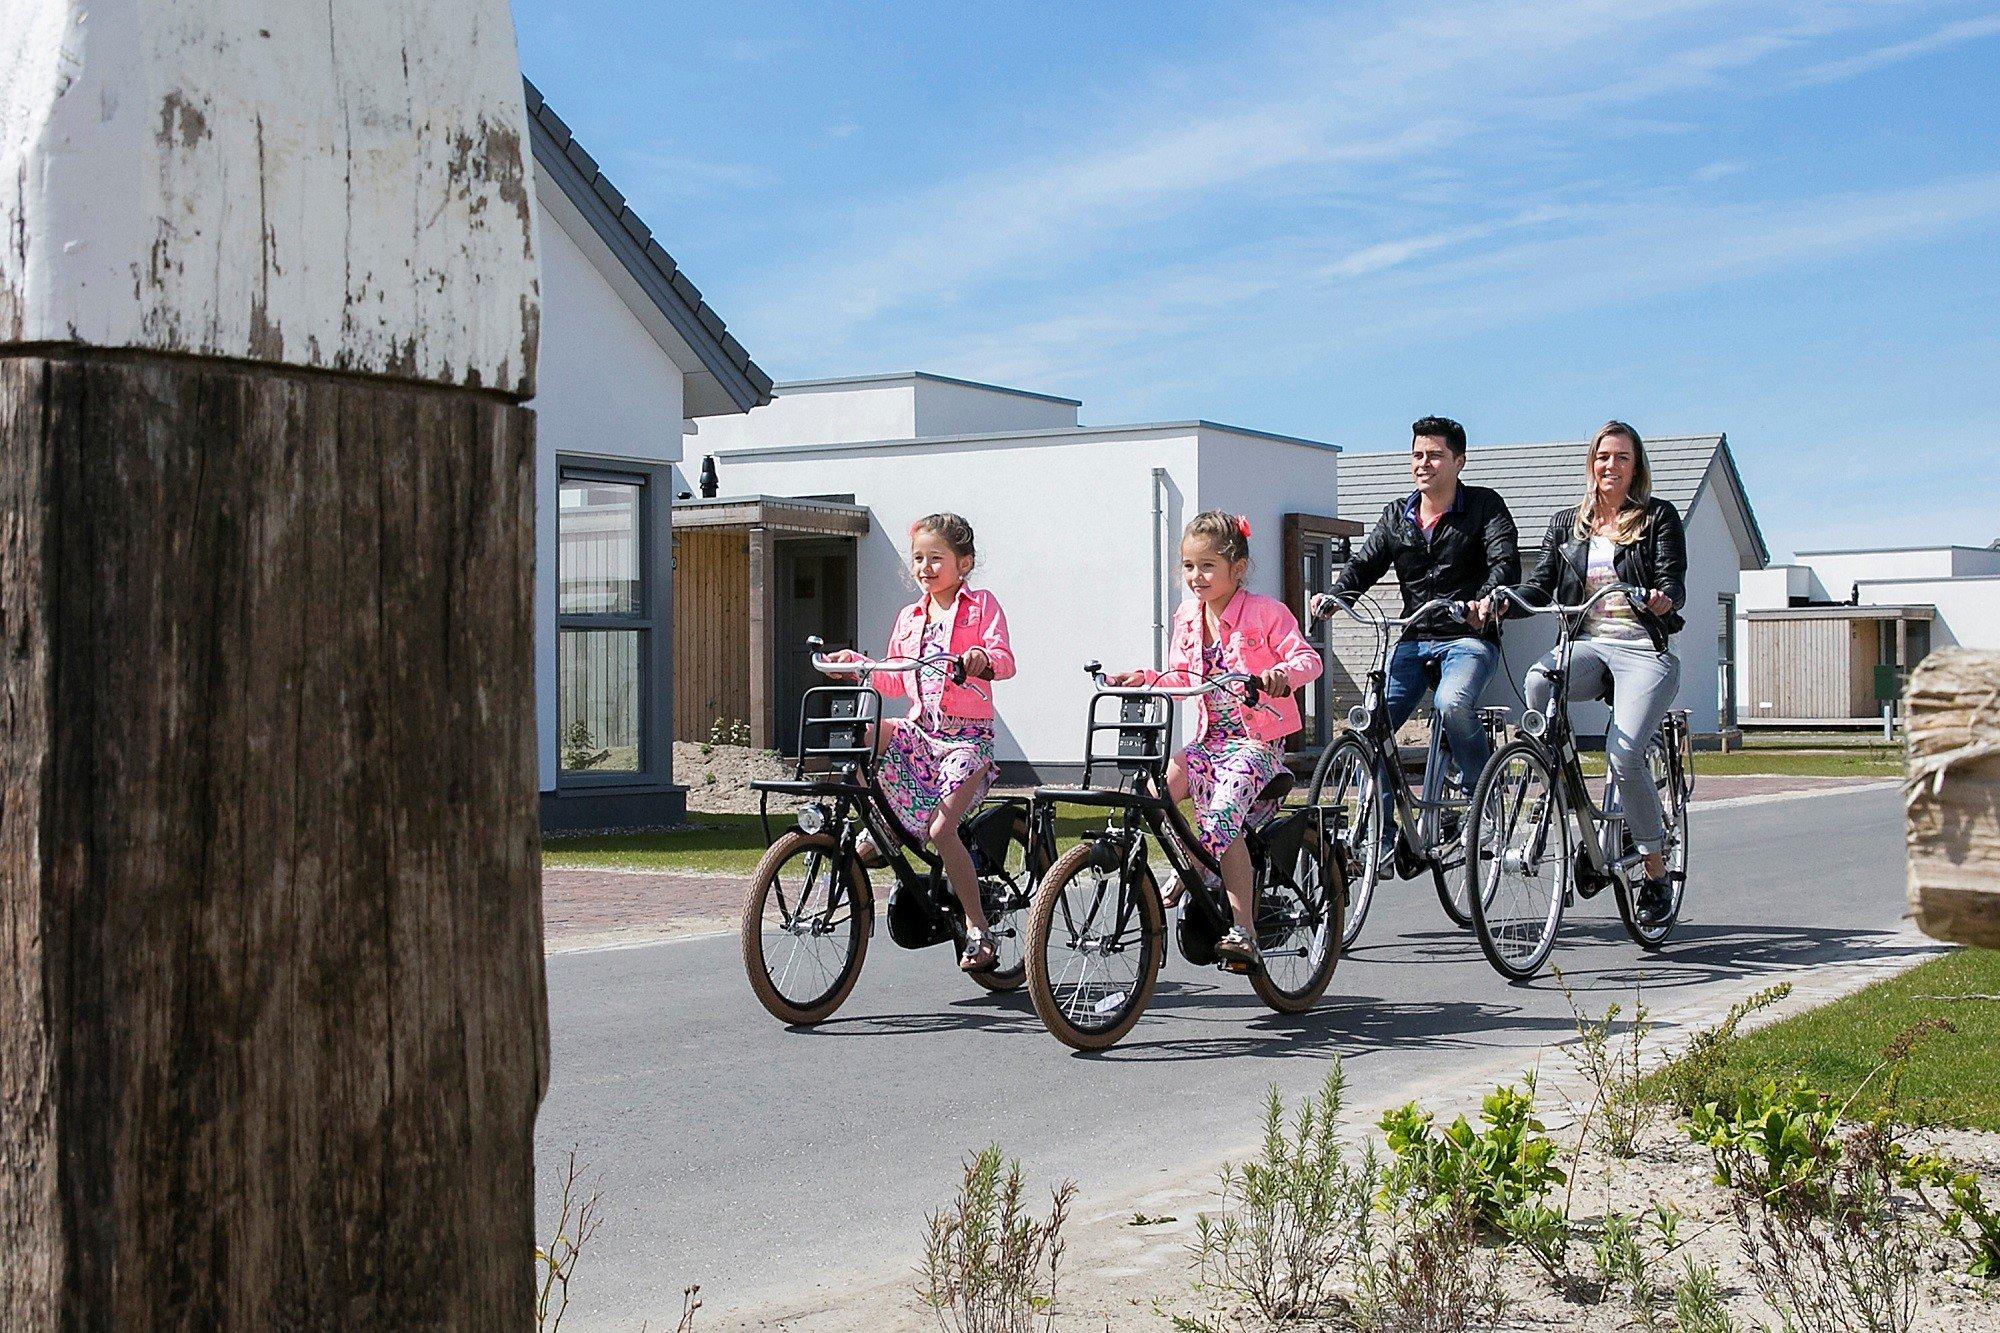 Dagaanbieding - Weekend, midweek of week met de hele familie op Strandpark Duynhille in Ouddorp dagelijkse koopjes